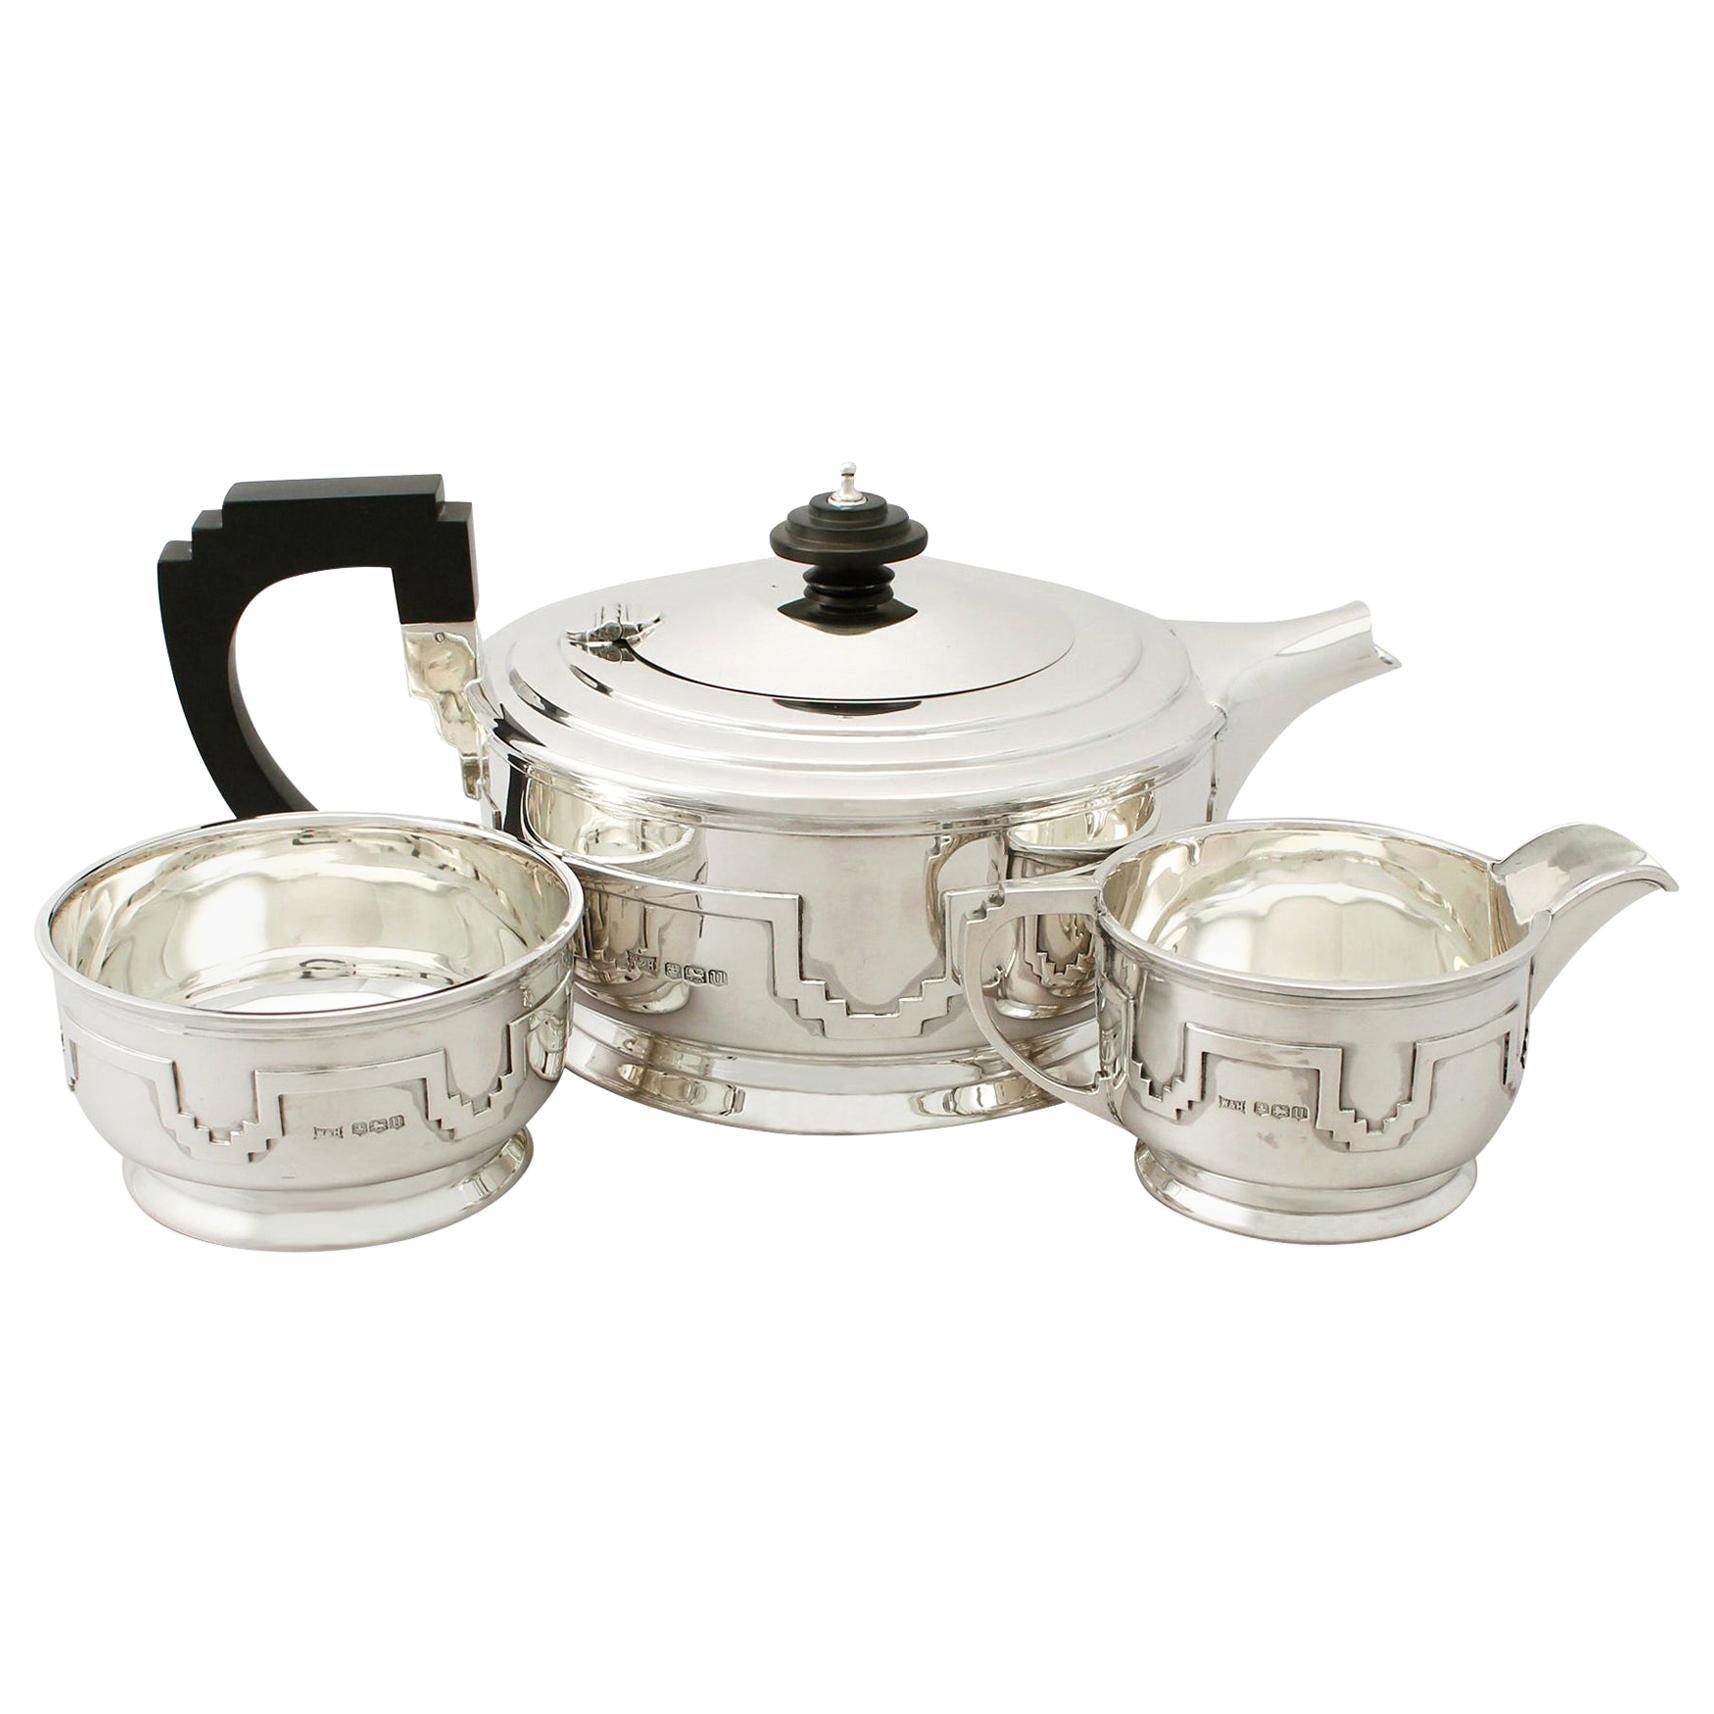 Antique George VI Art Deco Sterling Silver Three-Piece Tea Service